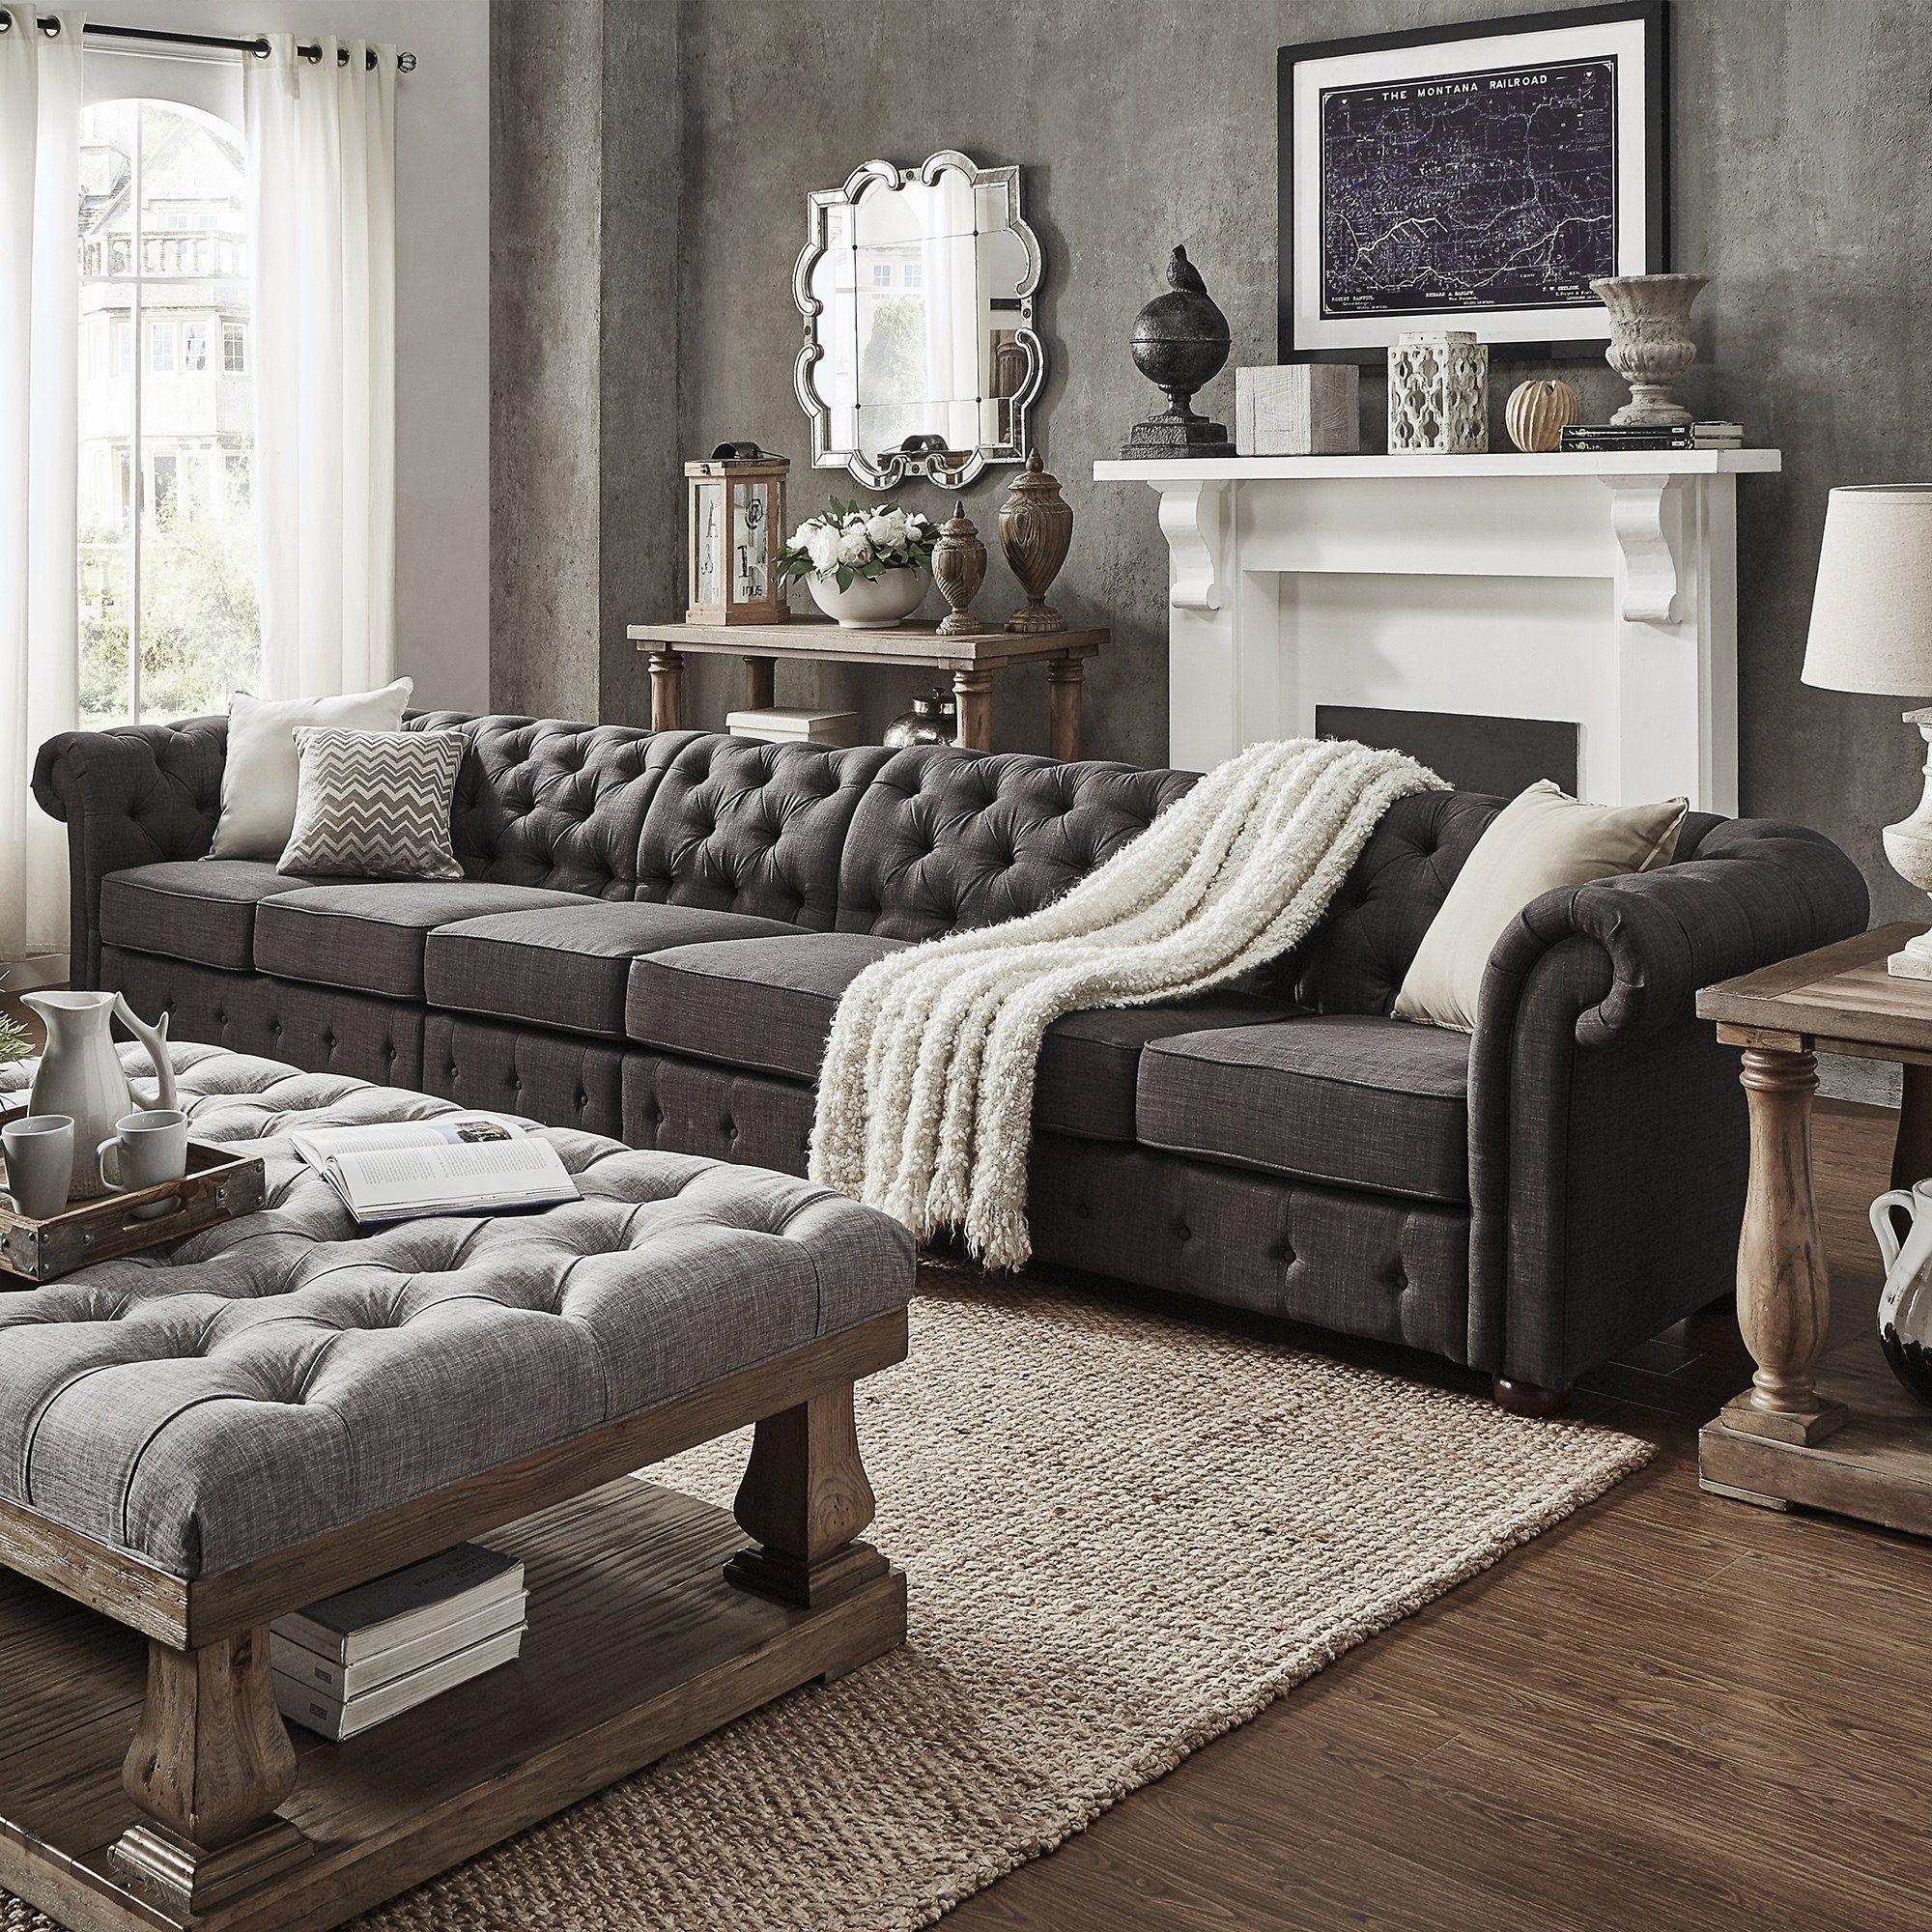 Knightsbridge Dark Grey Oversize 4 Seater Extra Long Tufted Chesterfield  Modular Sofa by iNSPIRE Q Artisan